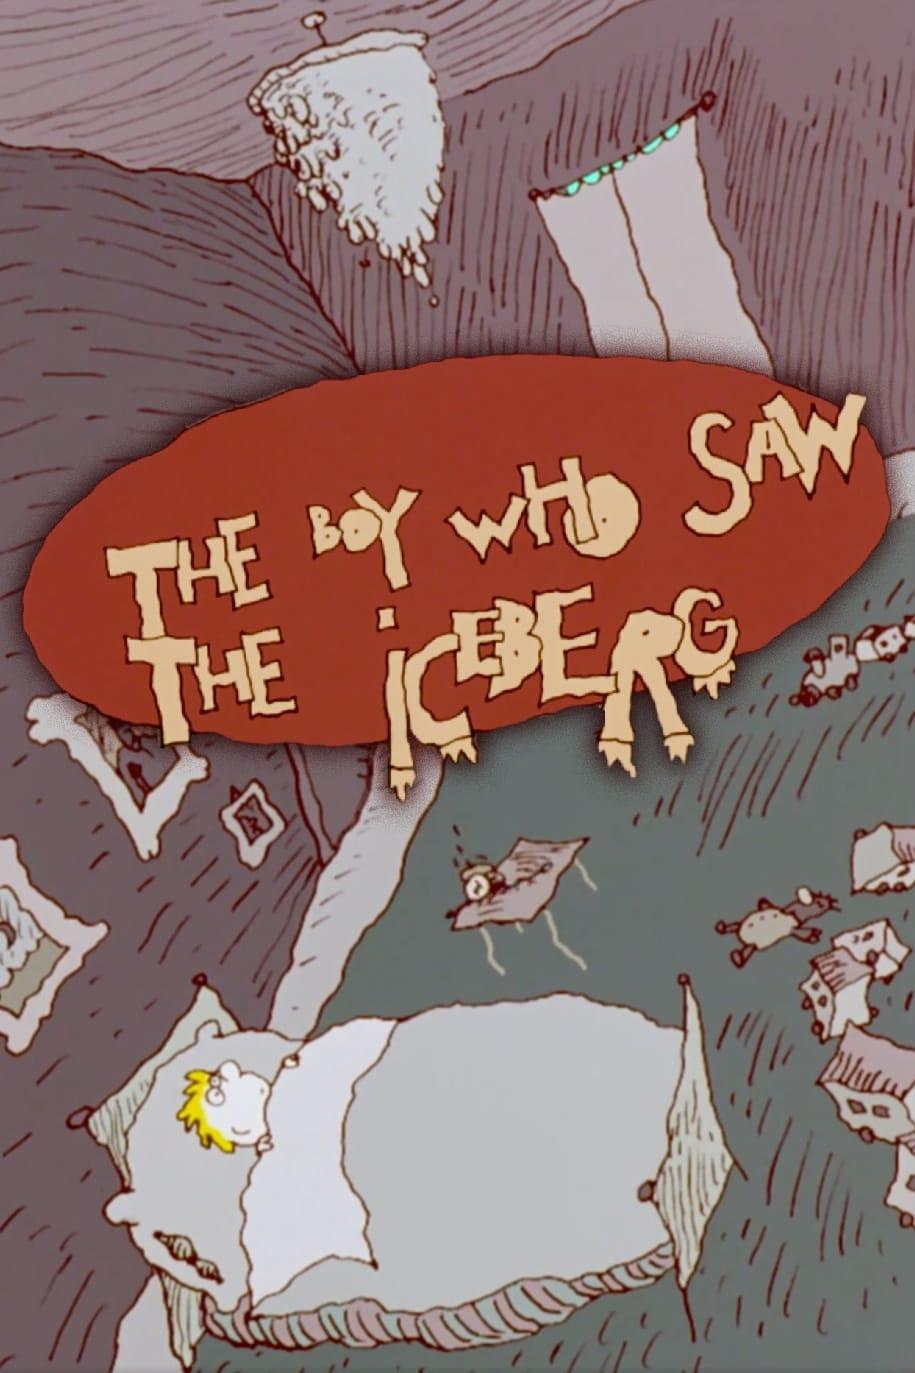 The Boy Who Saw the Iceberg (2000)